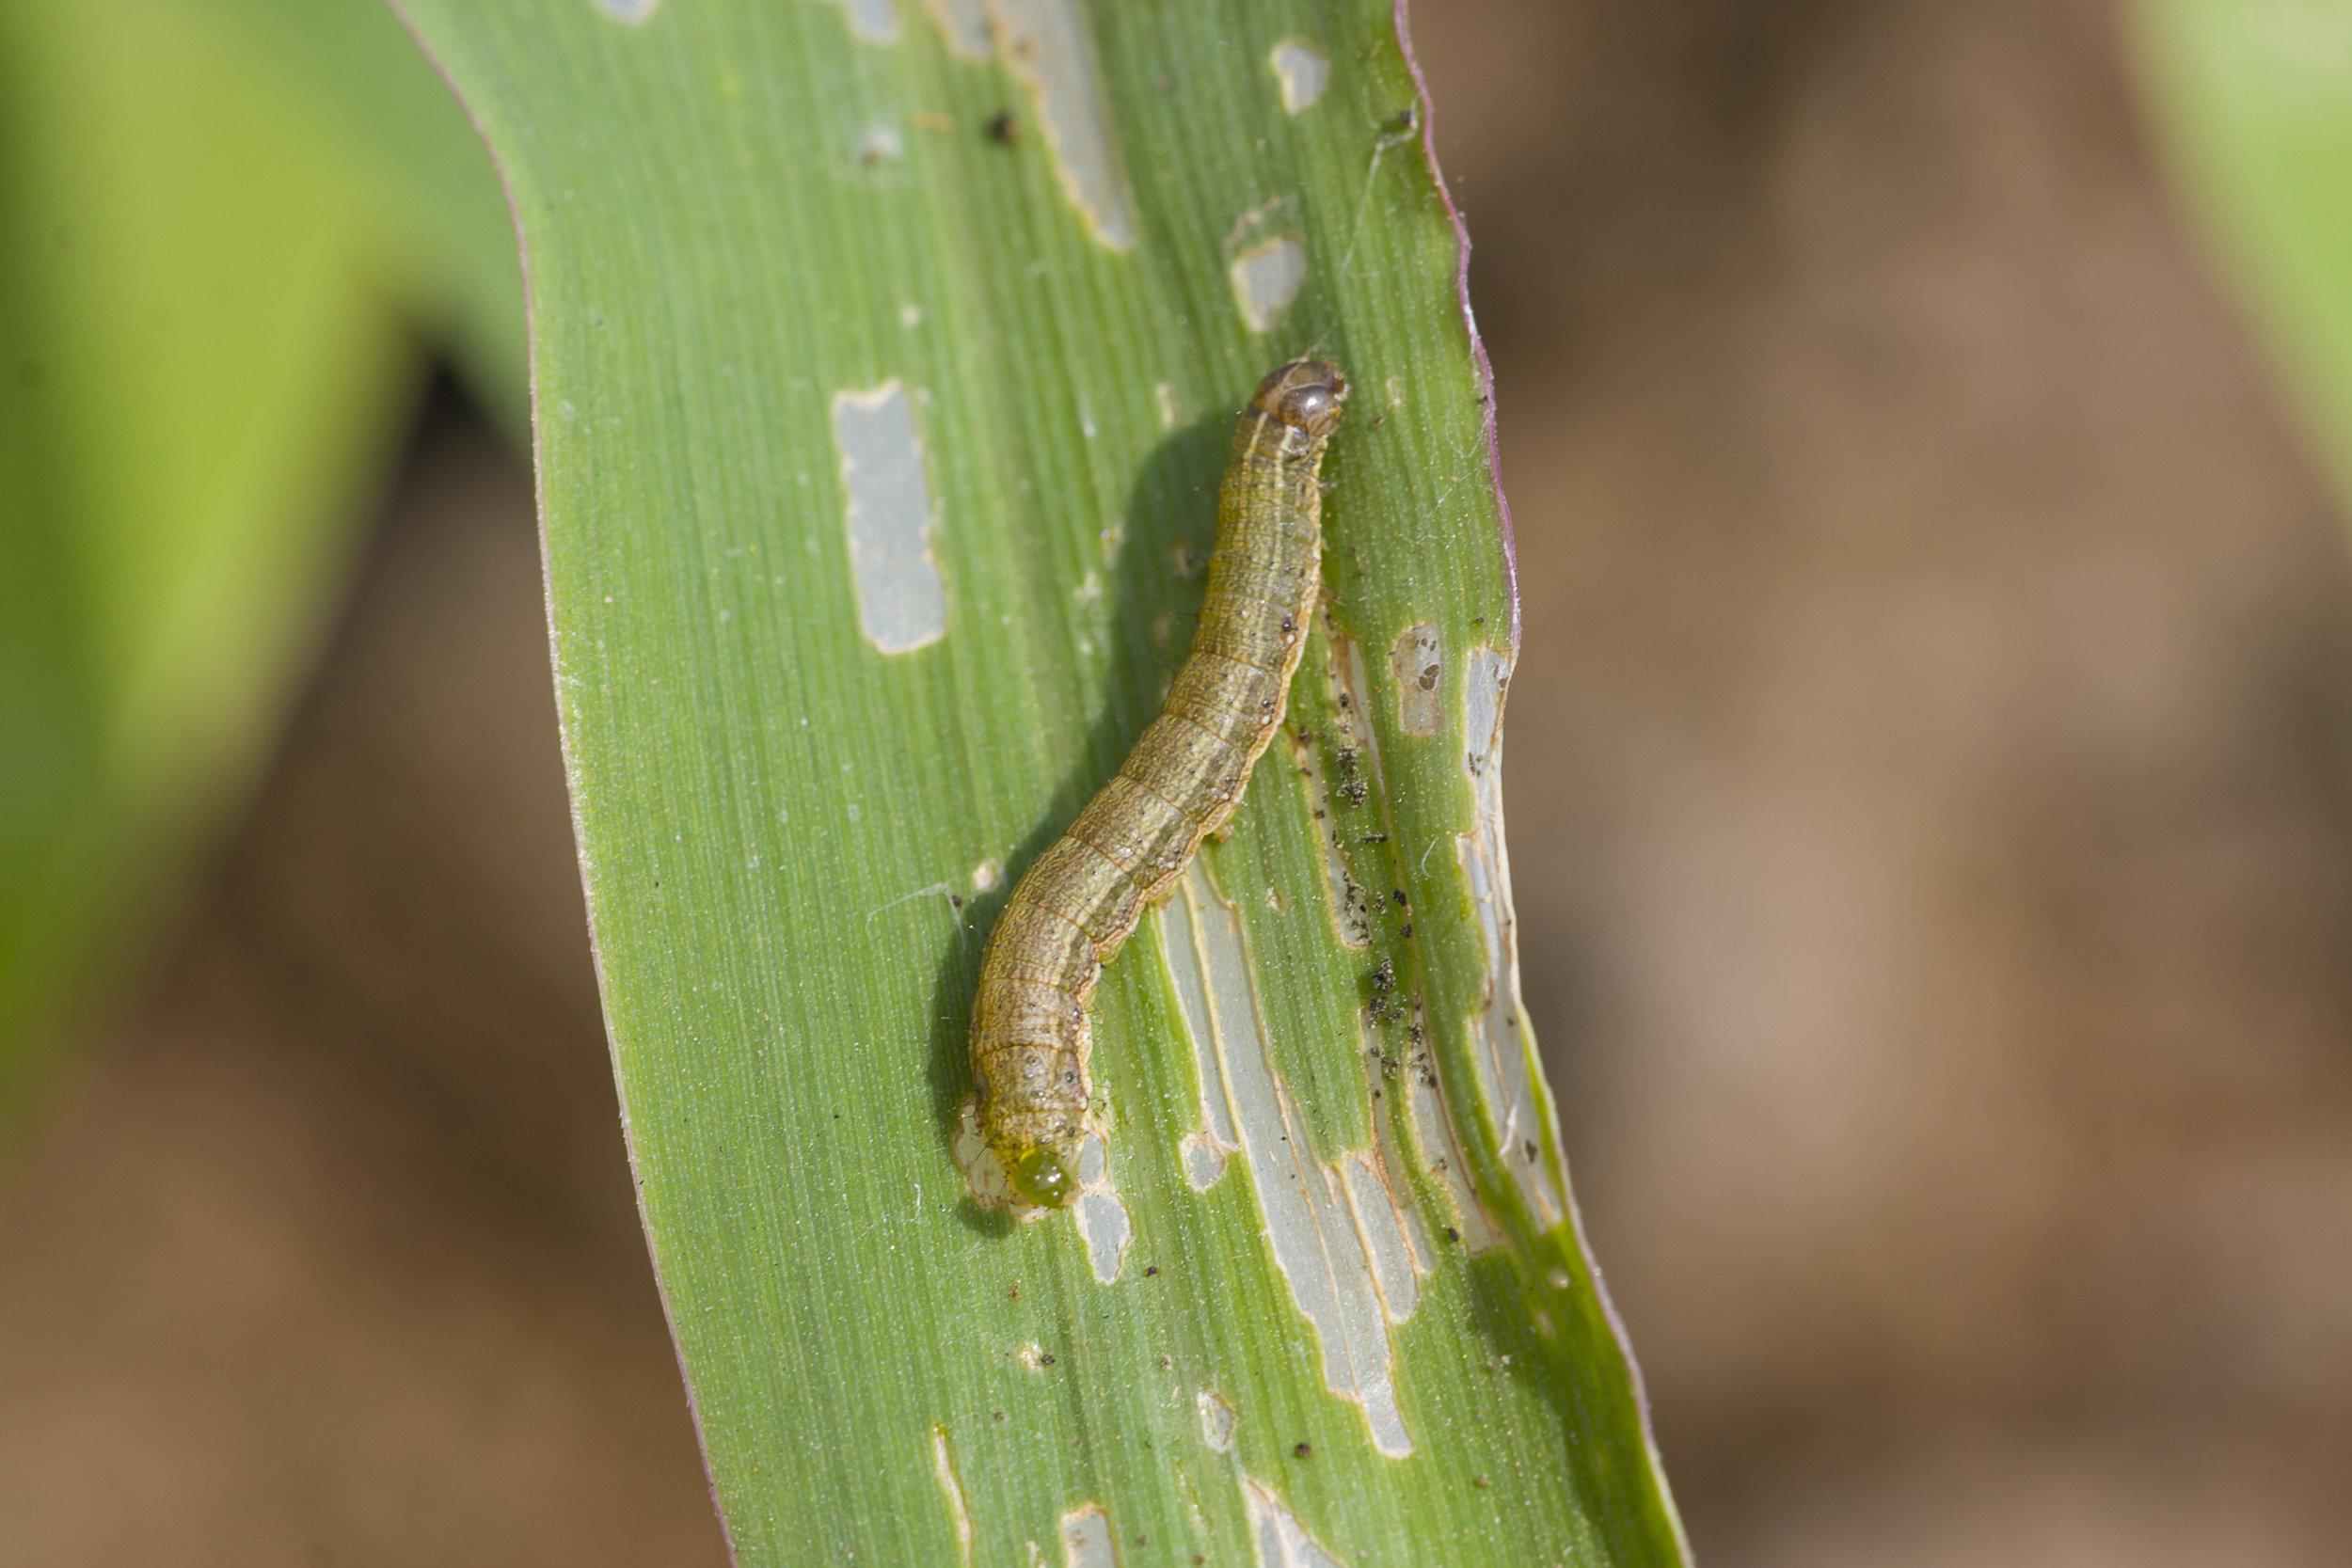 armyworms.jpg